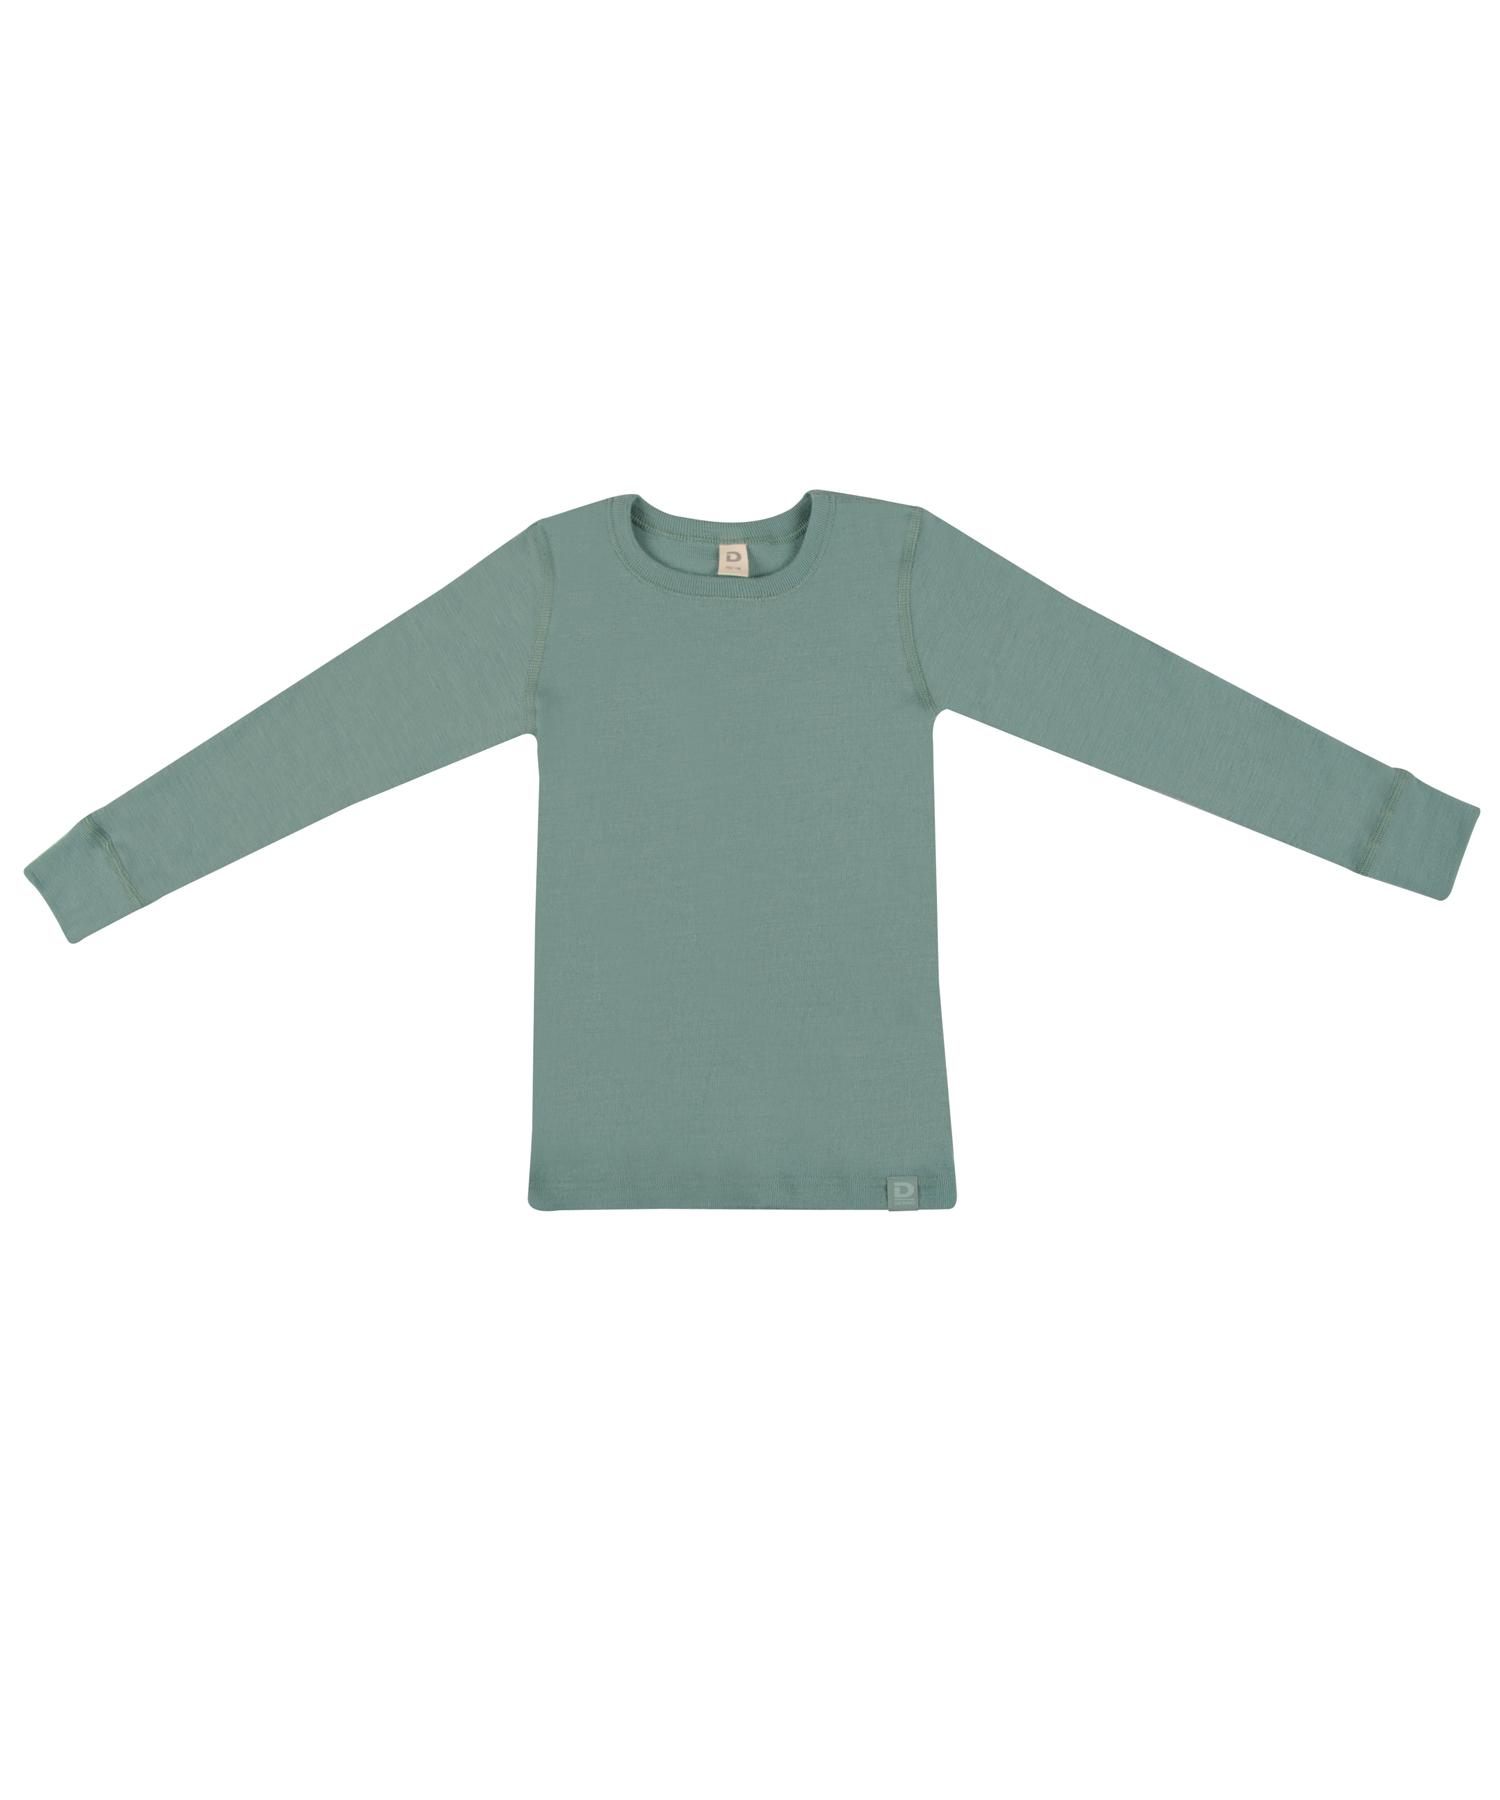 Kindermode, Schuhe & Access. Aktiv Jungen Hochschuhe SorgfäLtige FäRbeprozesse Kleidung & Accessoires